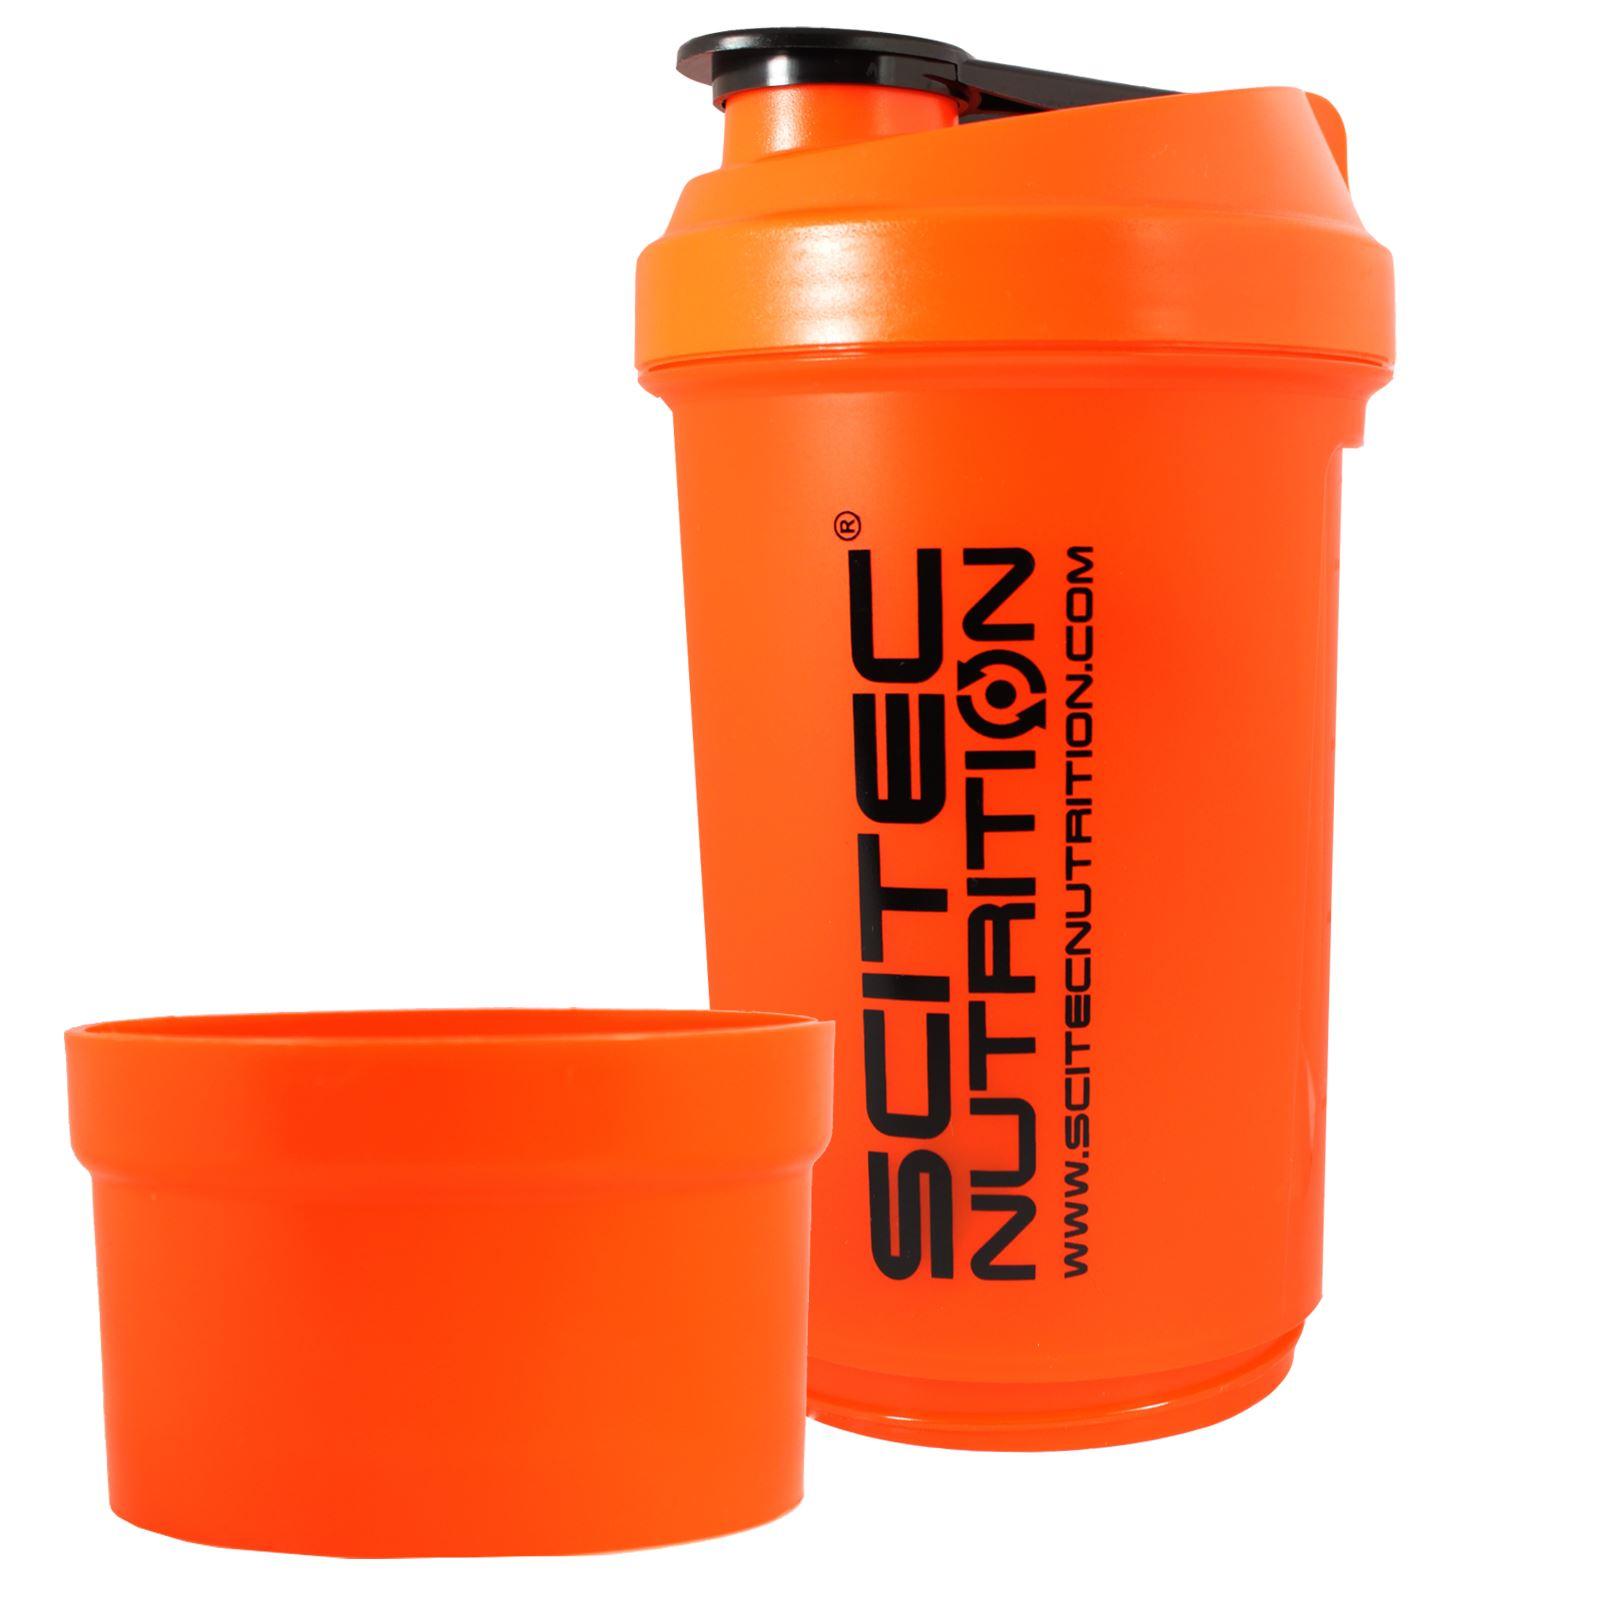 Klear Protein Shaker: Scitec Nutrition Protein Shaker Bottle 500ml Shake Mixer